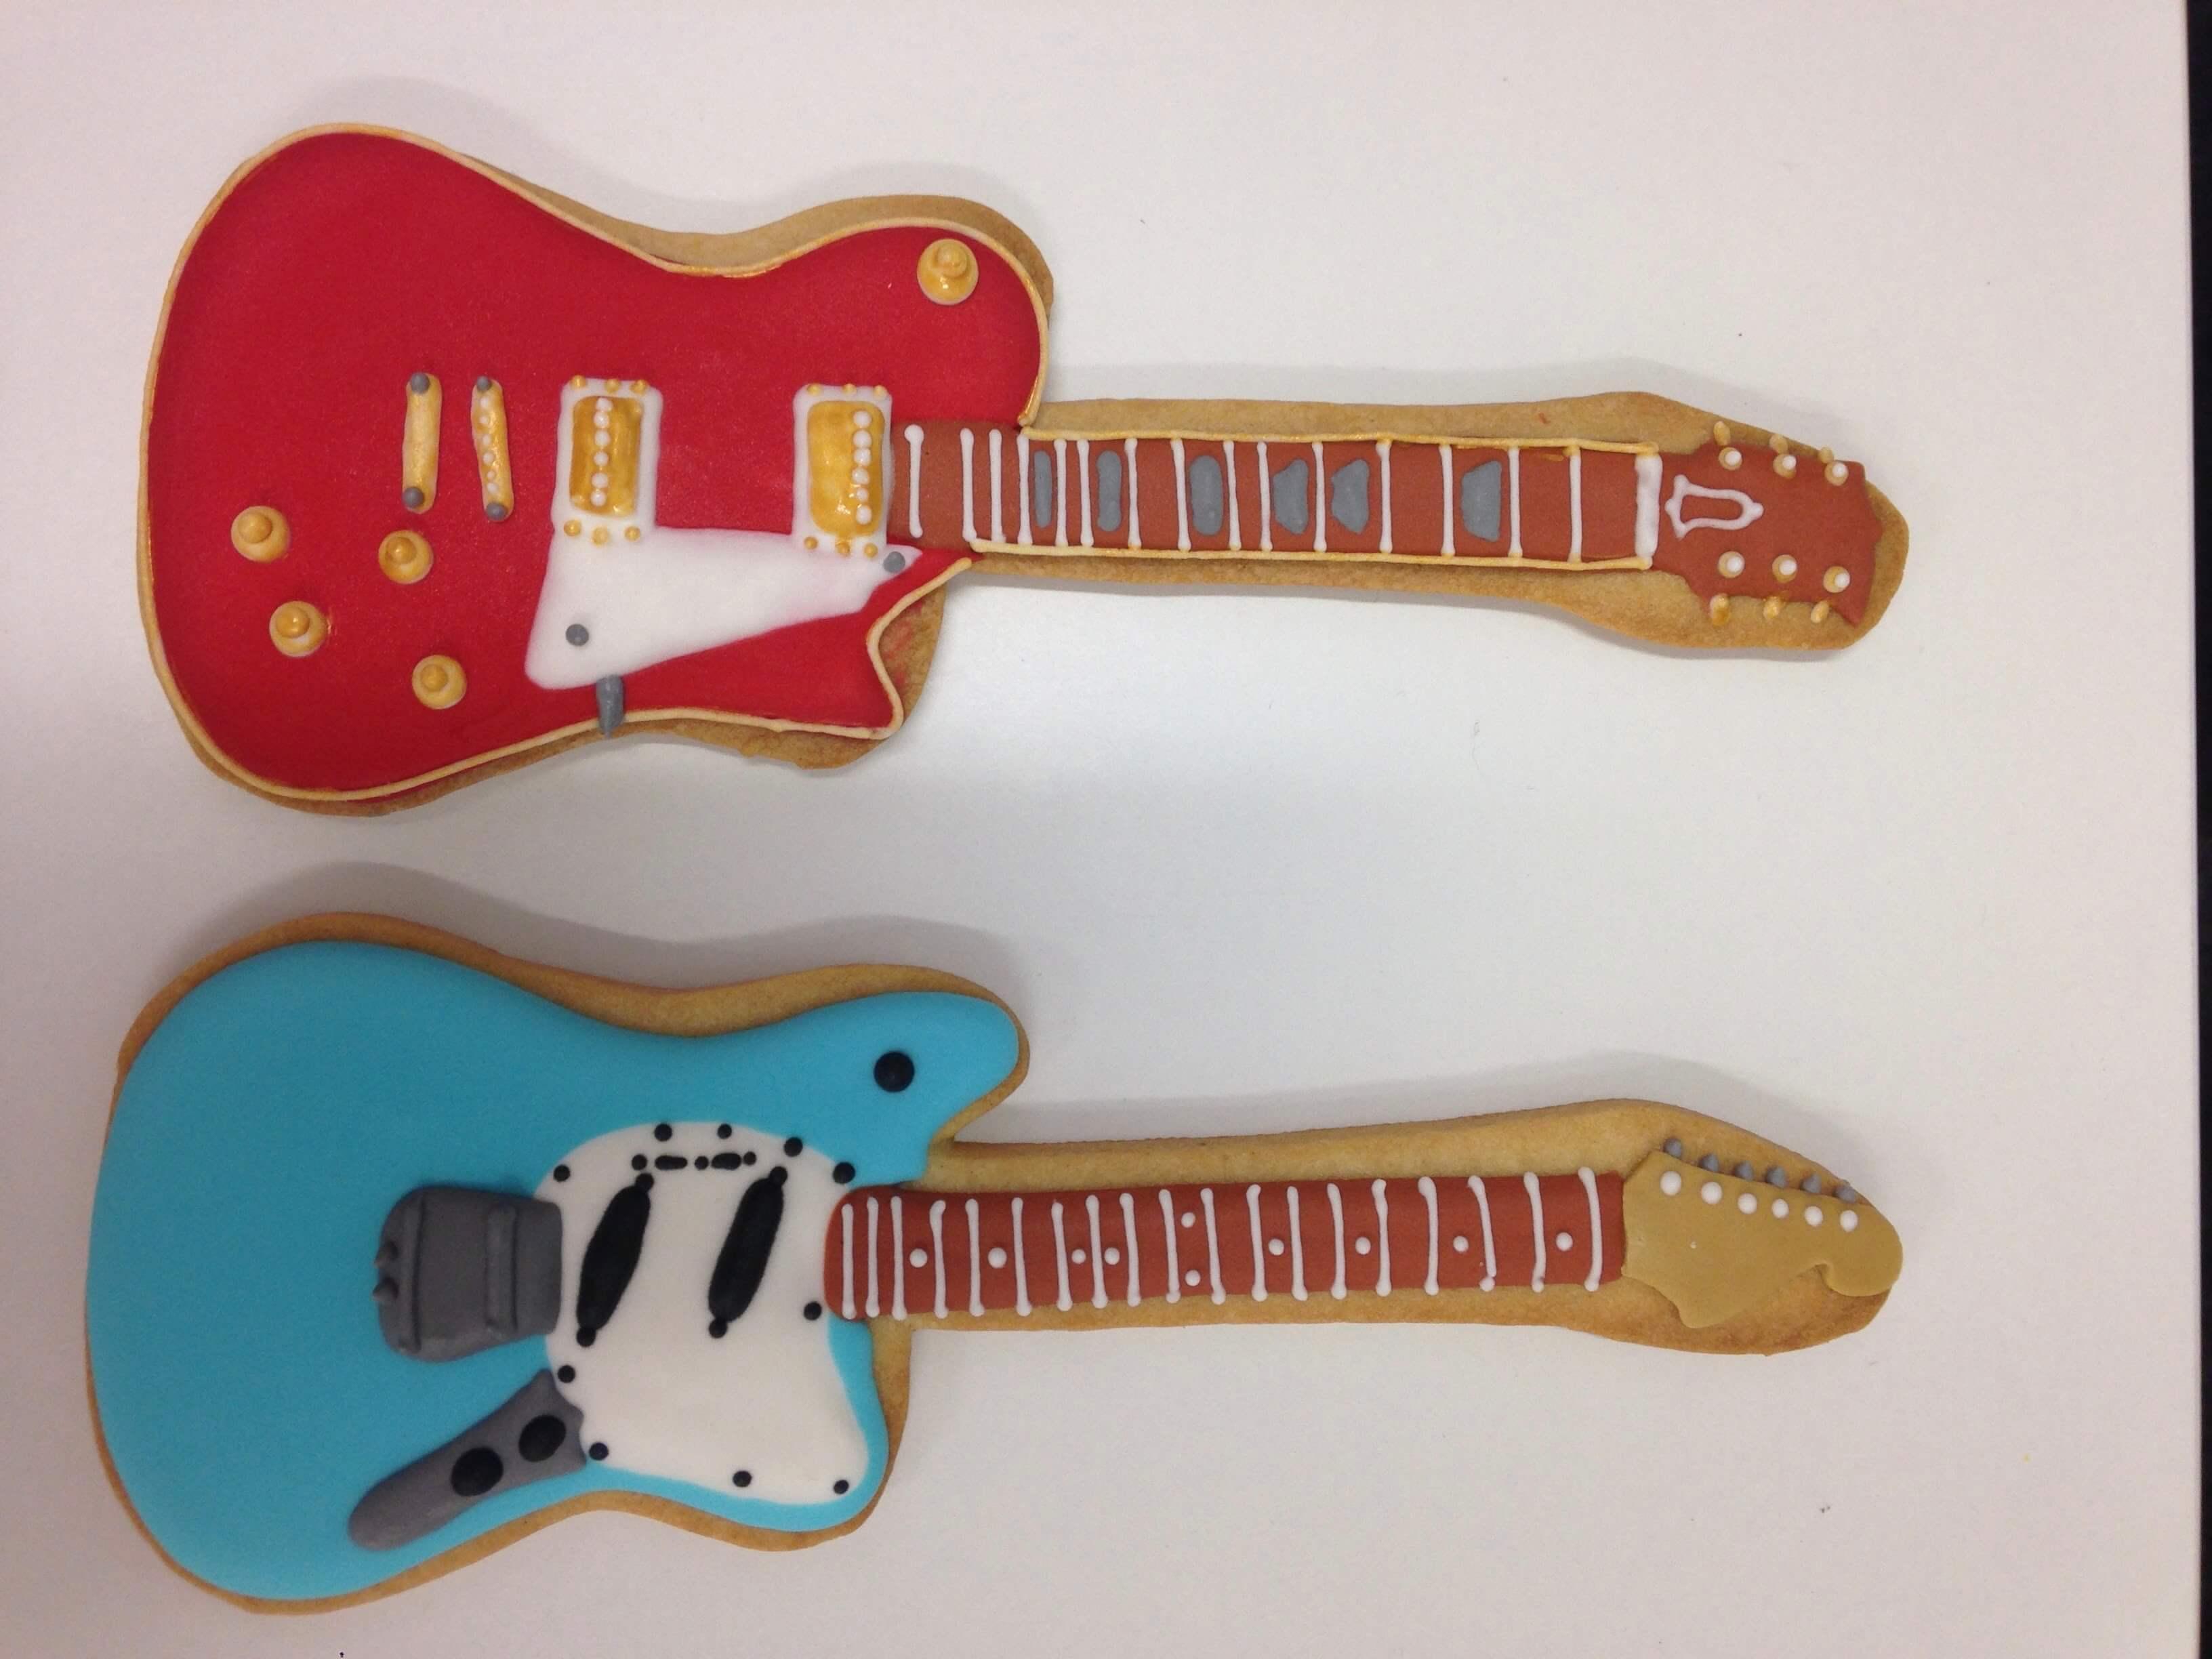 Galletas decoradas música notas musicales guitarra coruña galletas música